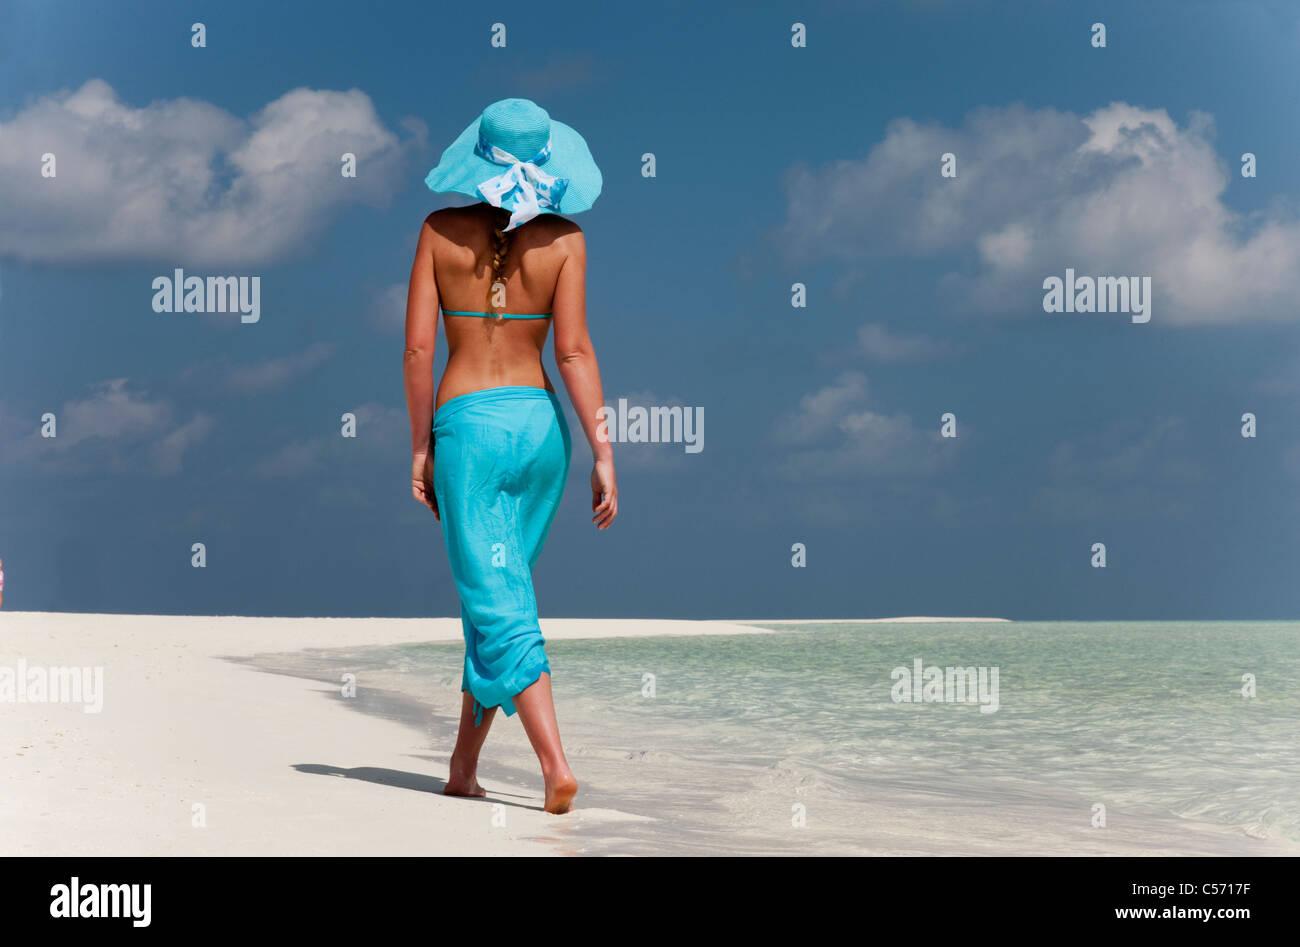 Woman walking on tropical beach - Stock Image